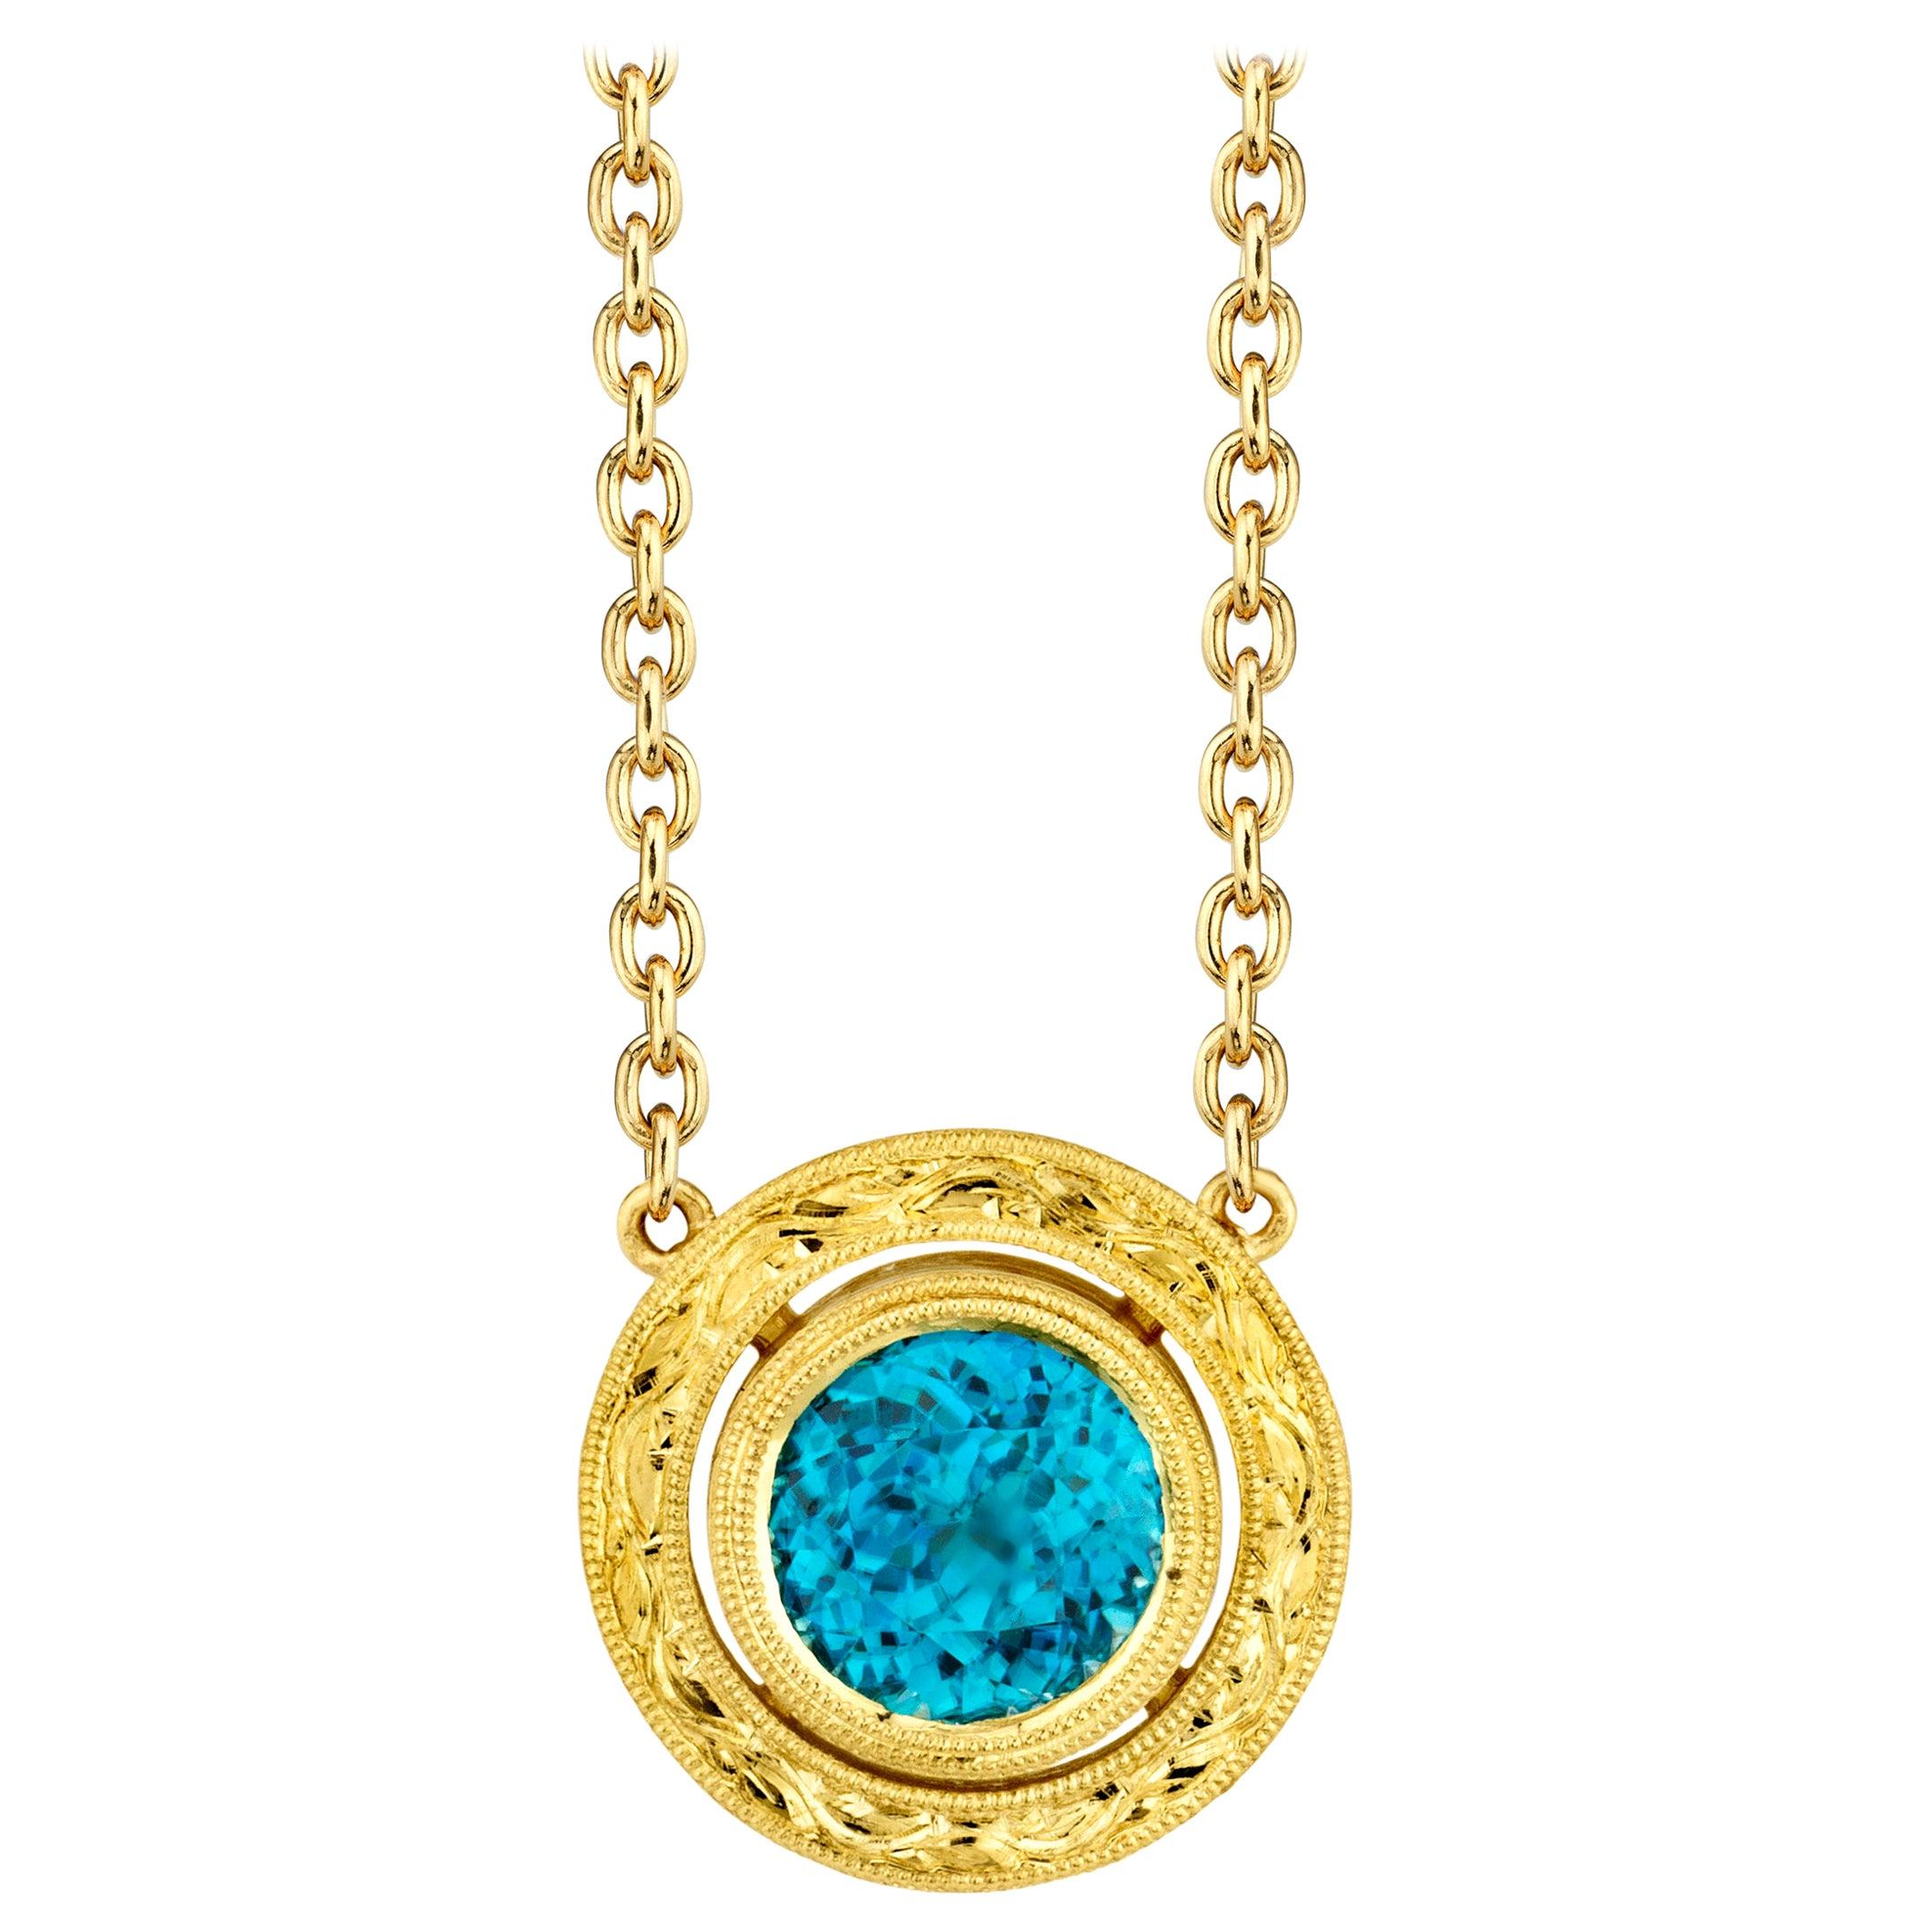 3.49 ct. Round Blue Zircon, 18k Yellow Gold Bezel Drop Pendant Chain Necklace